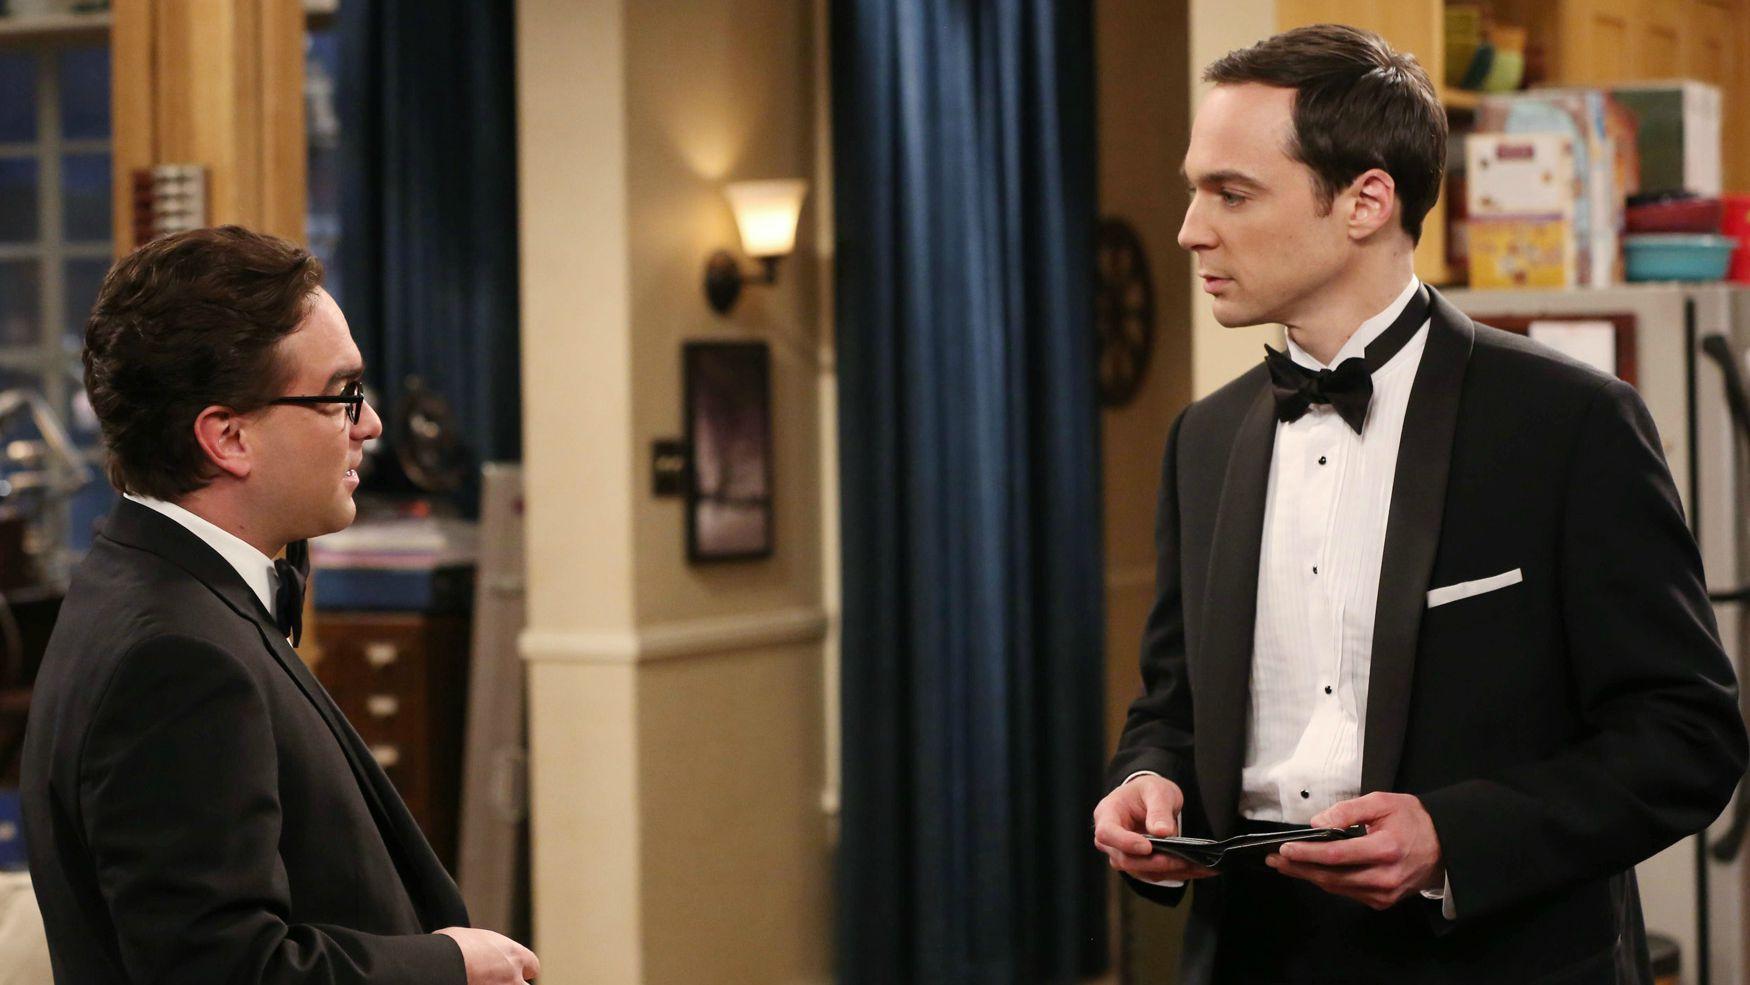 Dr. Leonard Hofstadter and Dr. Sheldon Cooper on The Big Bang Theory